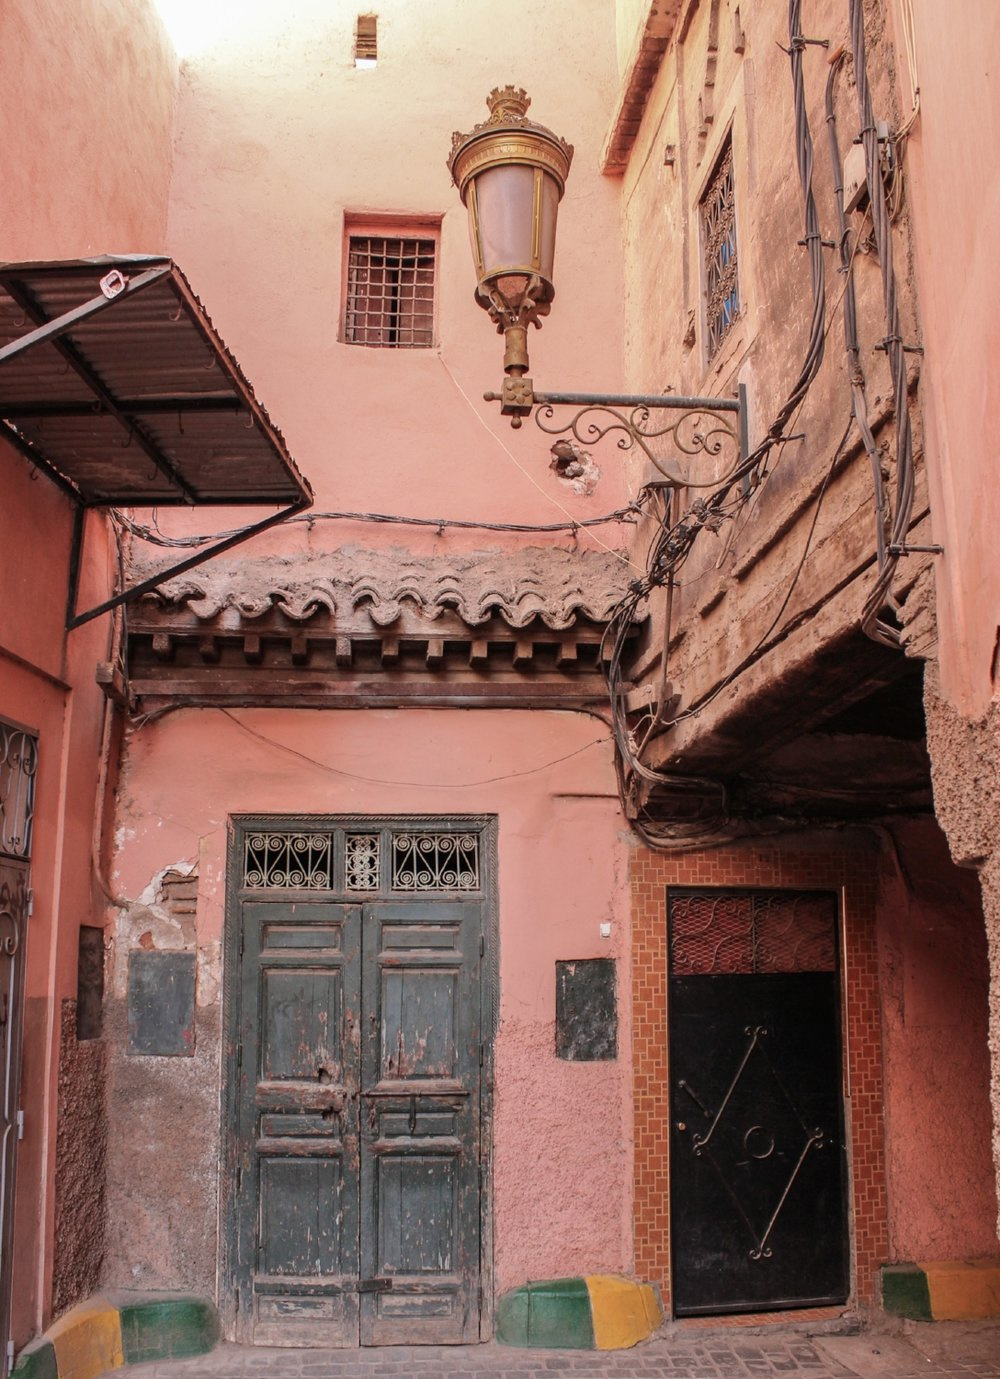 curio.trips.morocco.marrakesh.alley.jpg